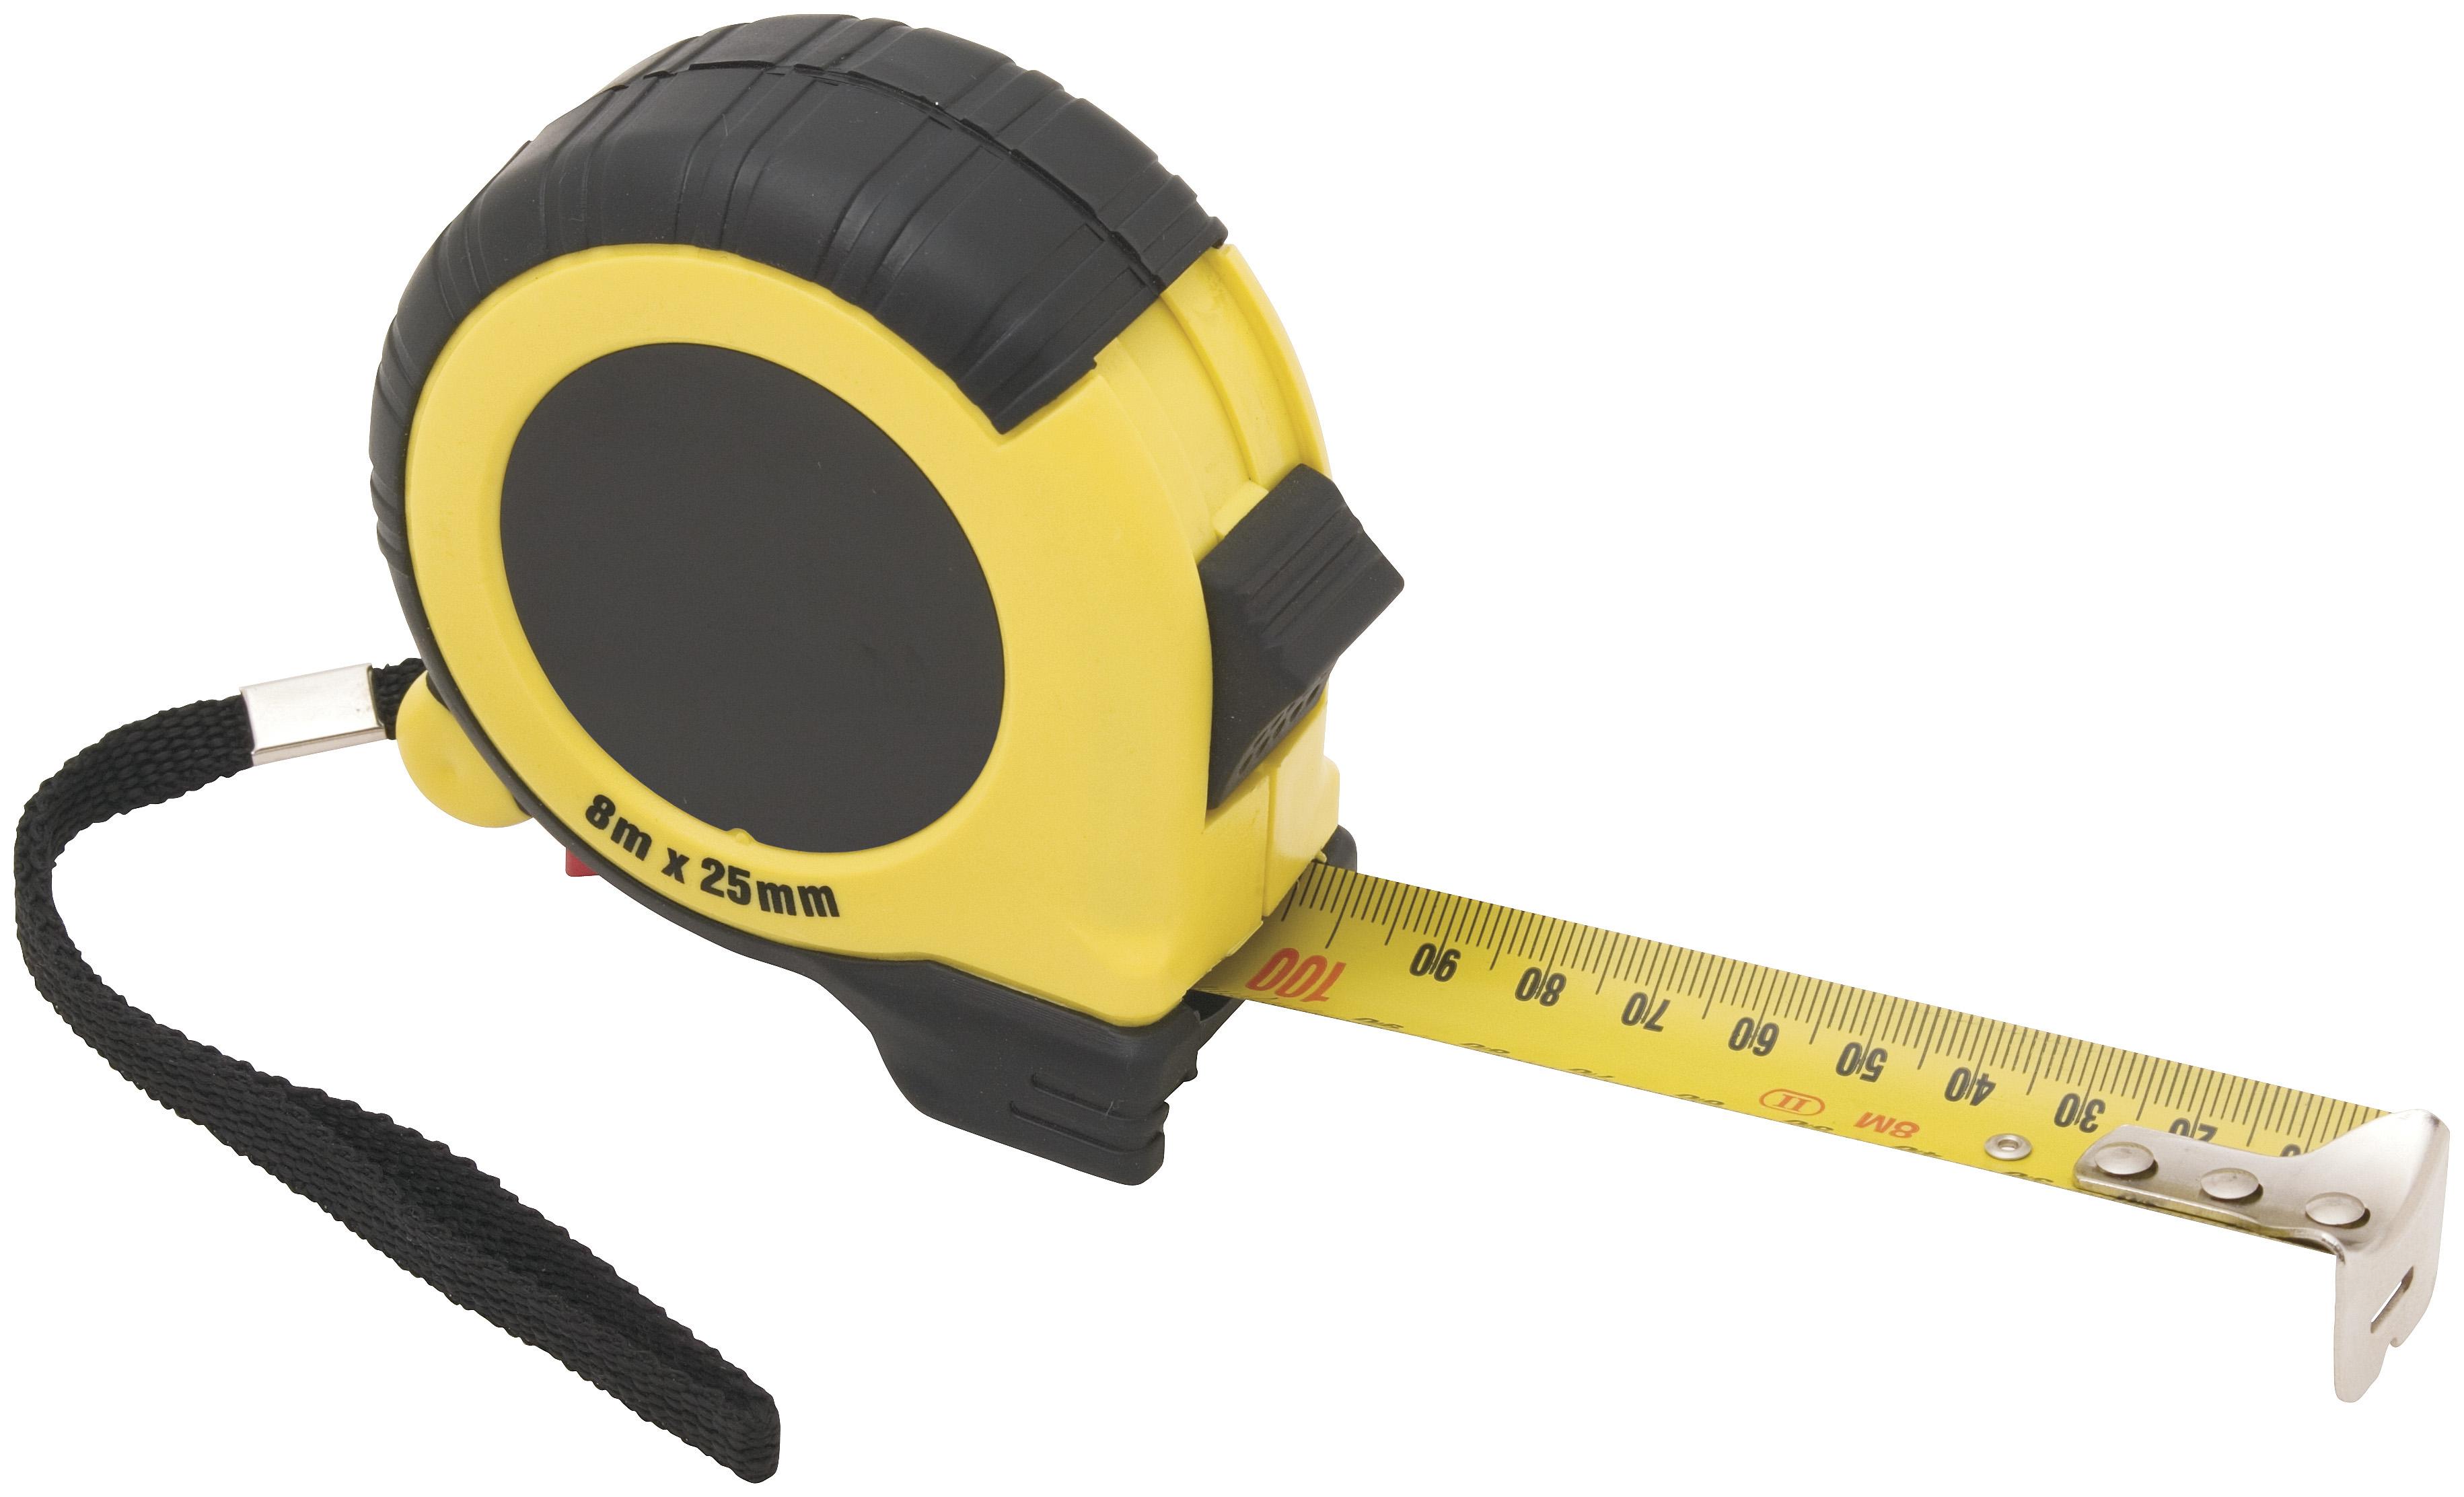 Tape- Measure Clipart - Clipart Suggest